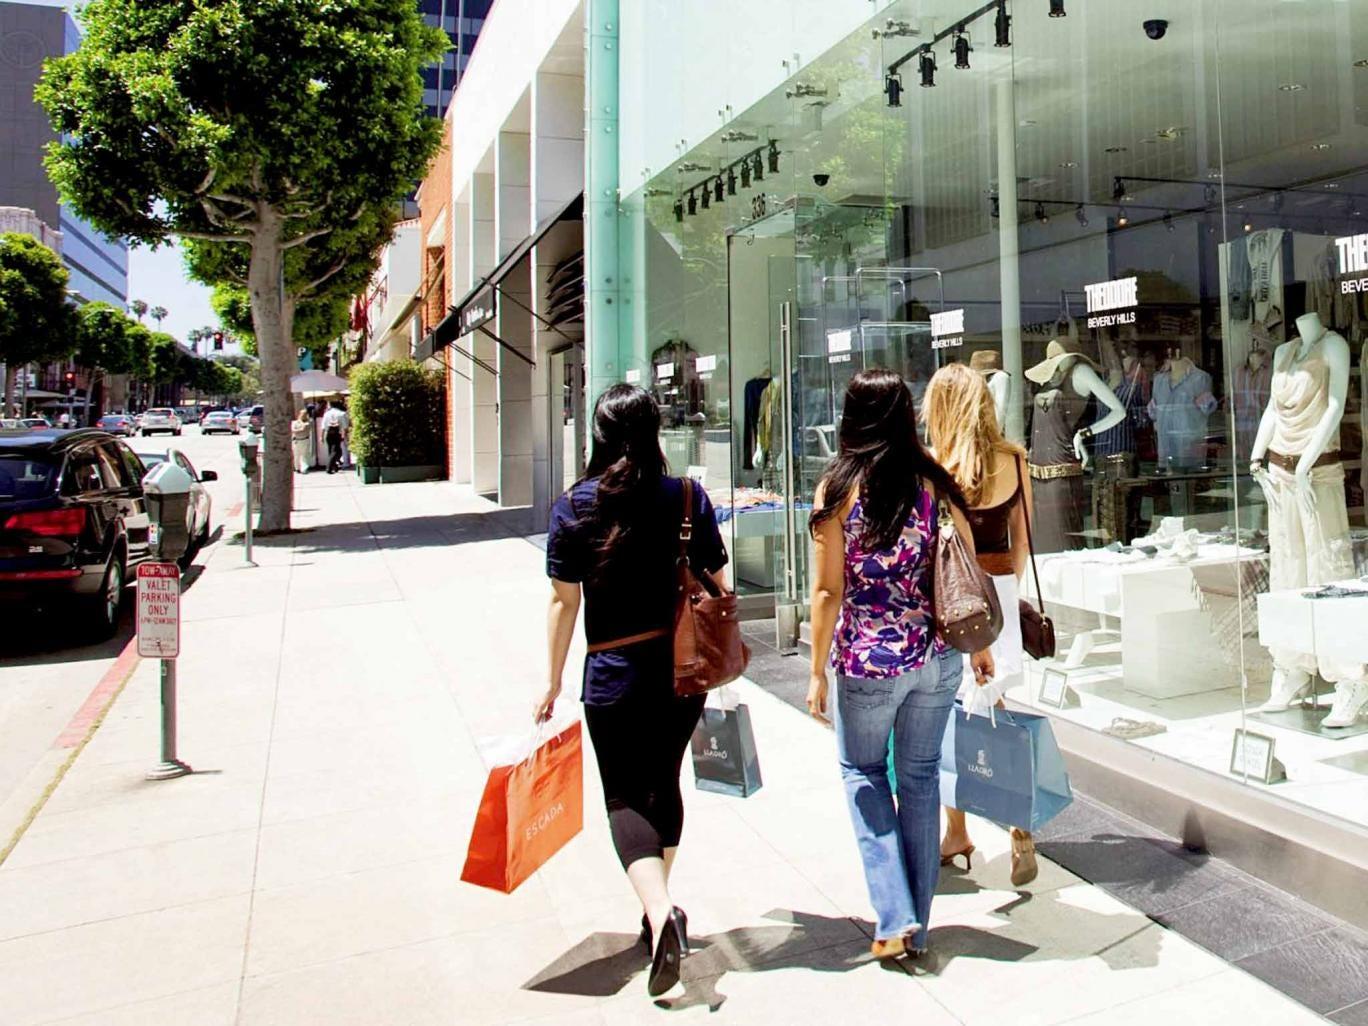 Don't walk: hitting the shops